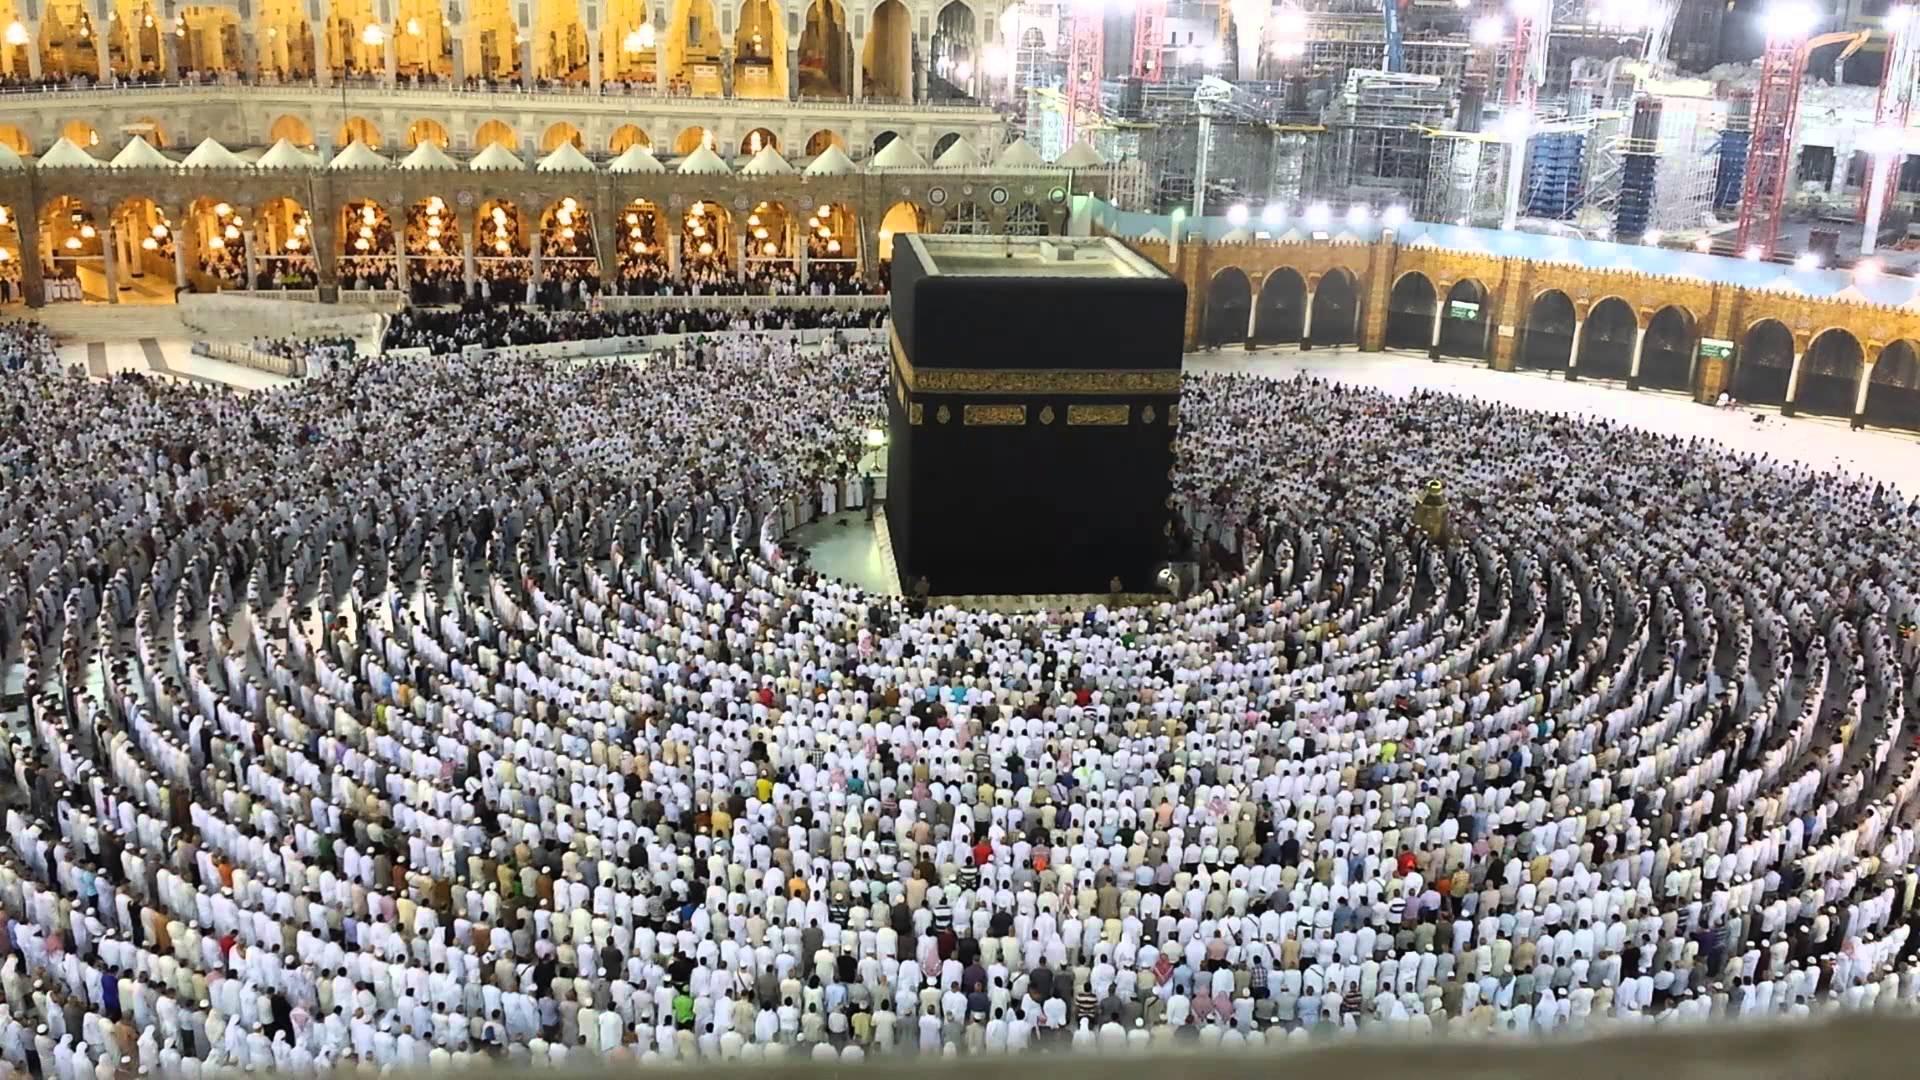 Top Saudi Imam Calls to Kill Christians, Jews & Shia Muslims in Prayer Broadcast (Video)